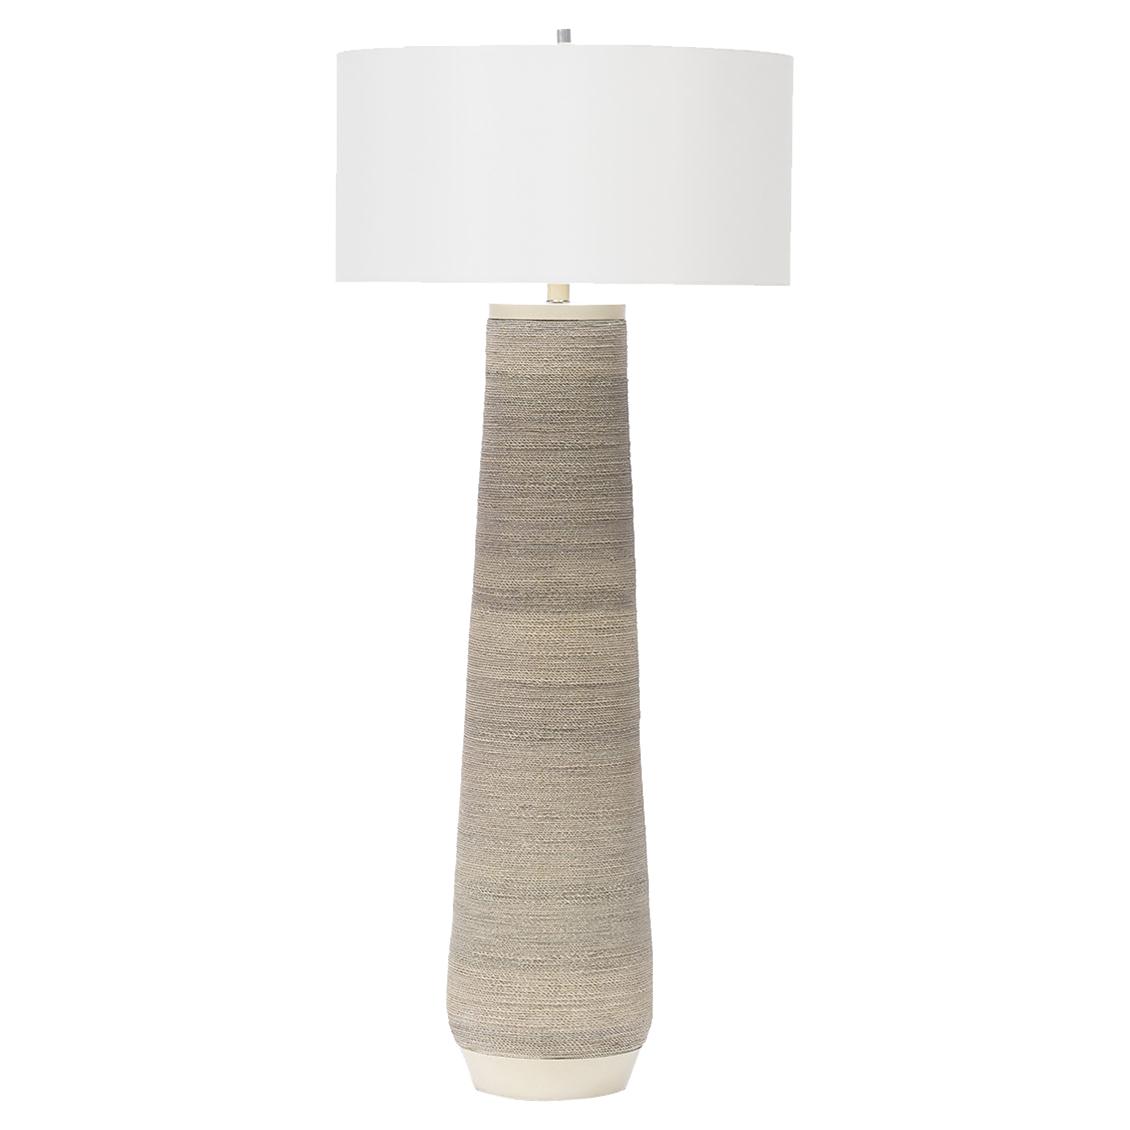 Designer floor lamps eclectic floor lamps kathy kuo home palecek aviana coastal beach rope floor lamp aloadofball Choice Image